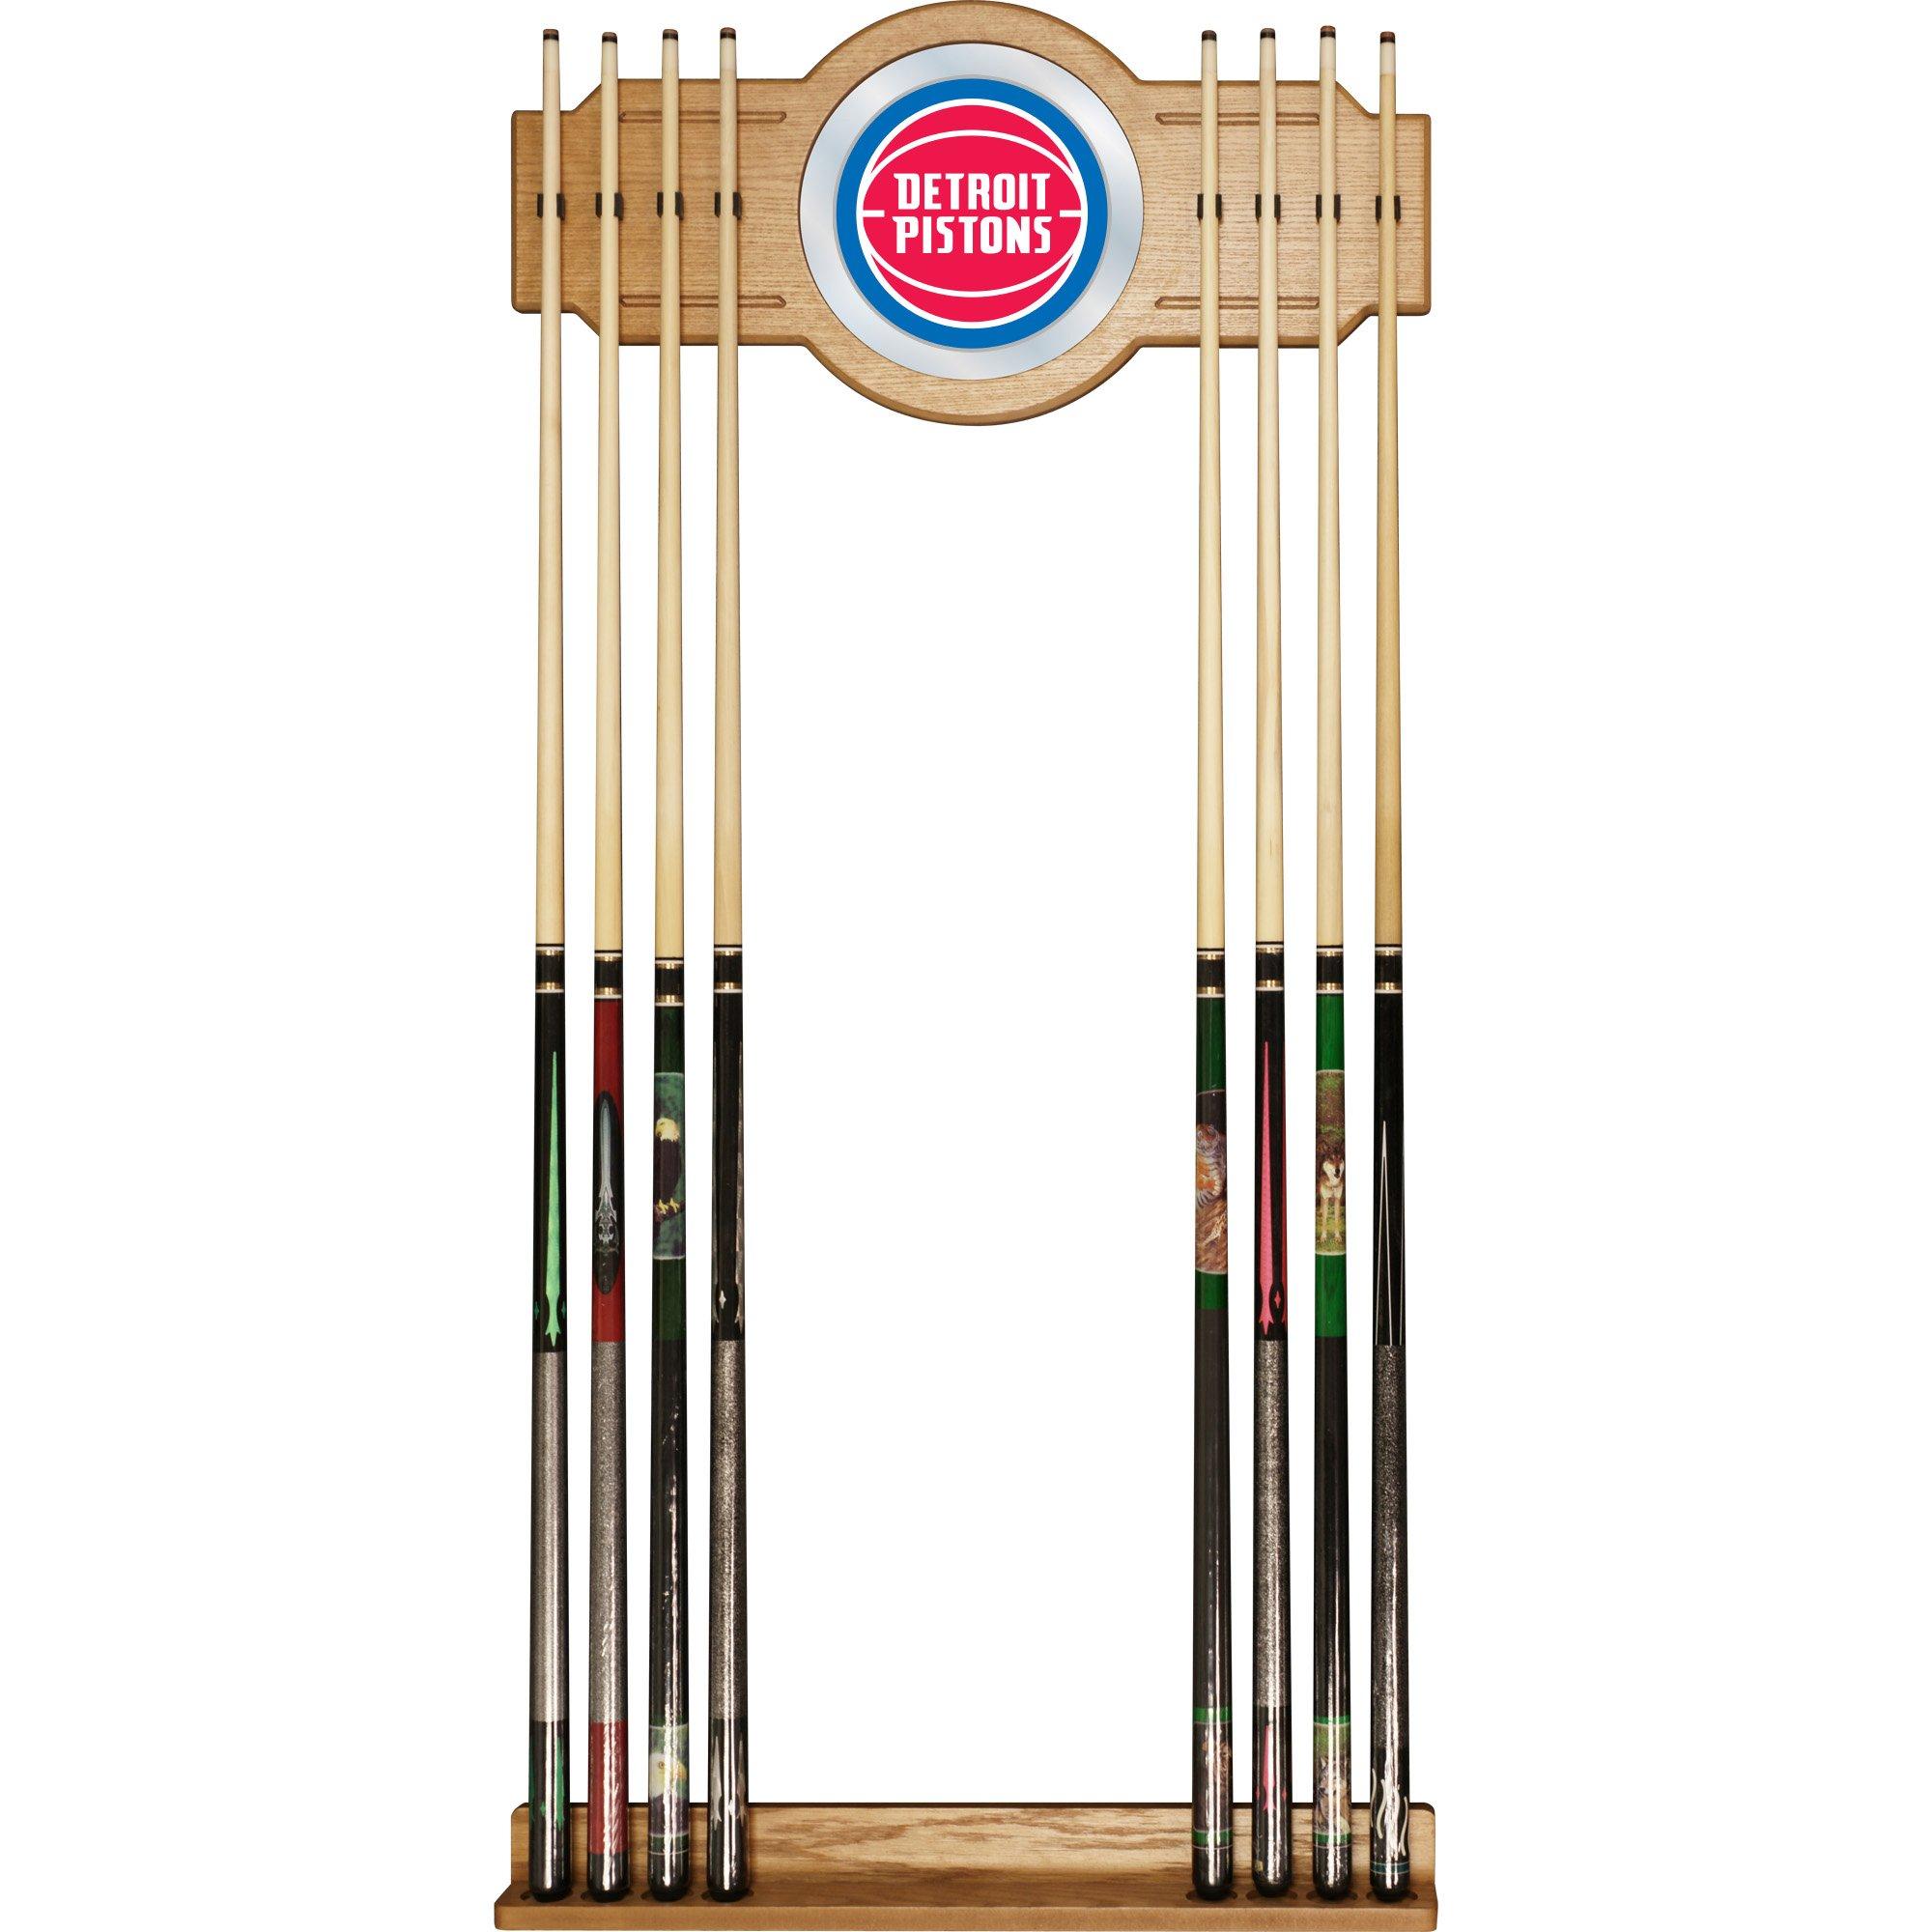 NBA Detroit Pistons Billiard Cue Rack with Mirror